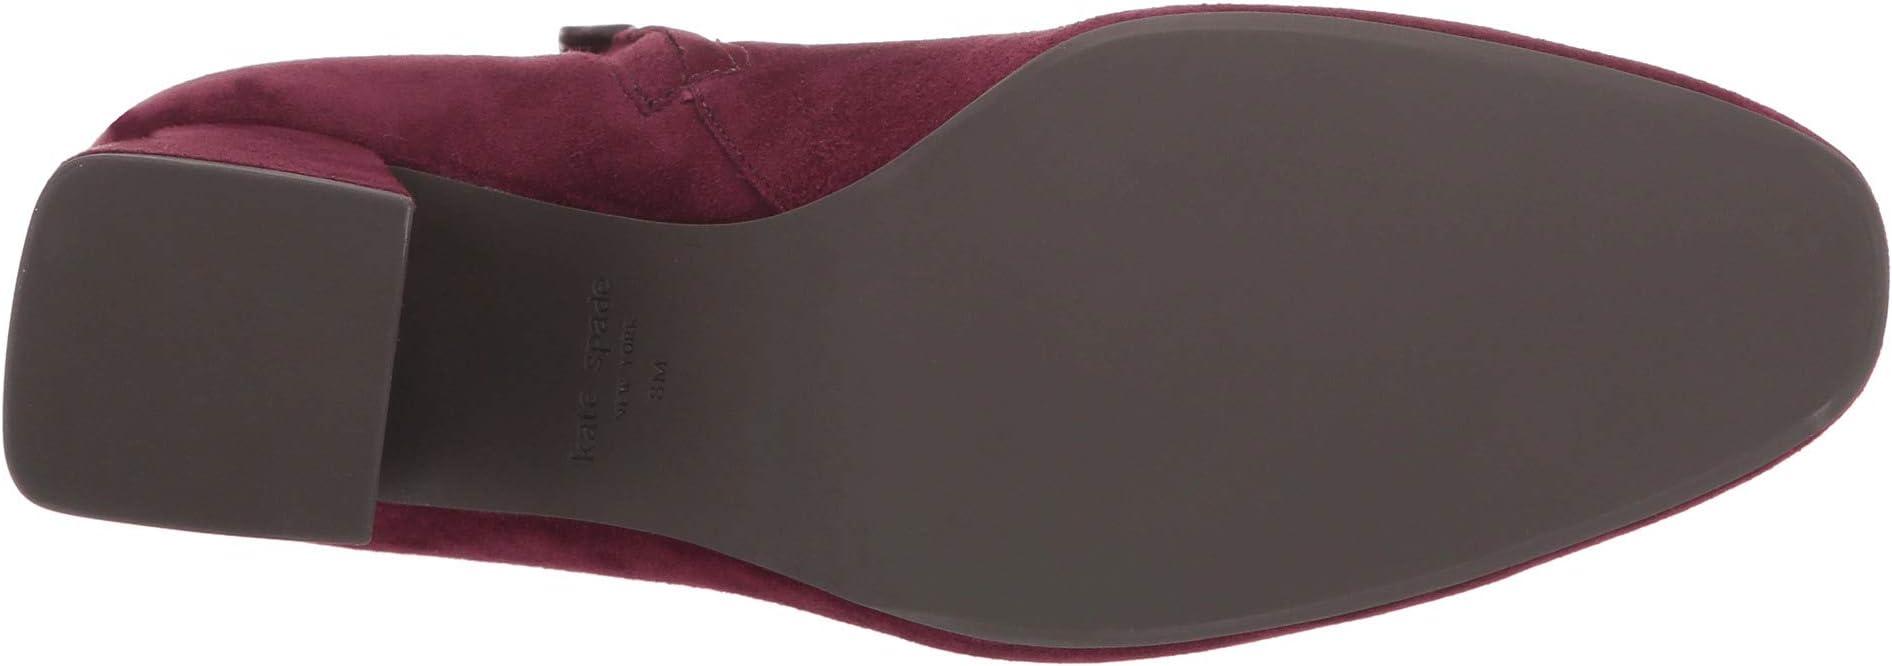 Kate Spade New York Alihandra | Women's shoes | 2020 Newest